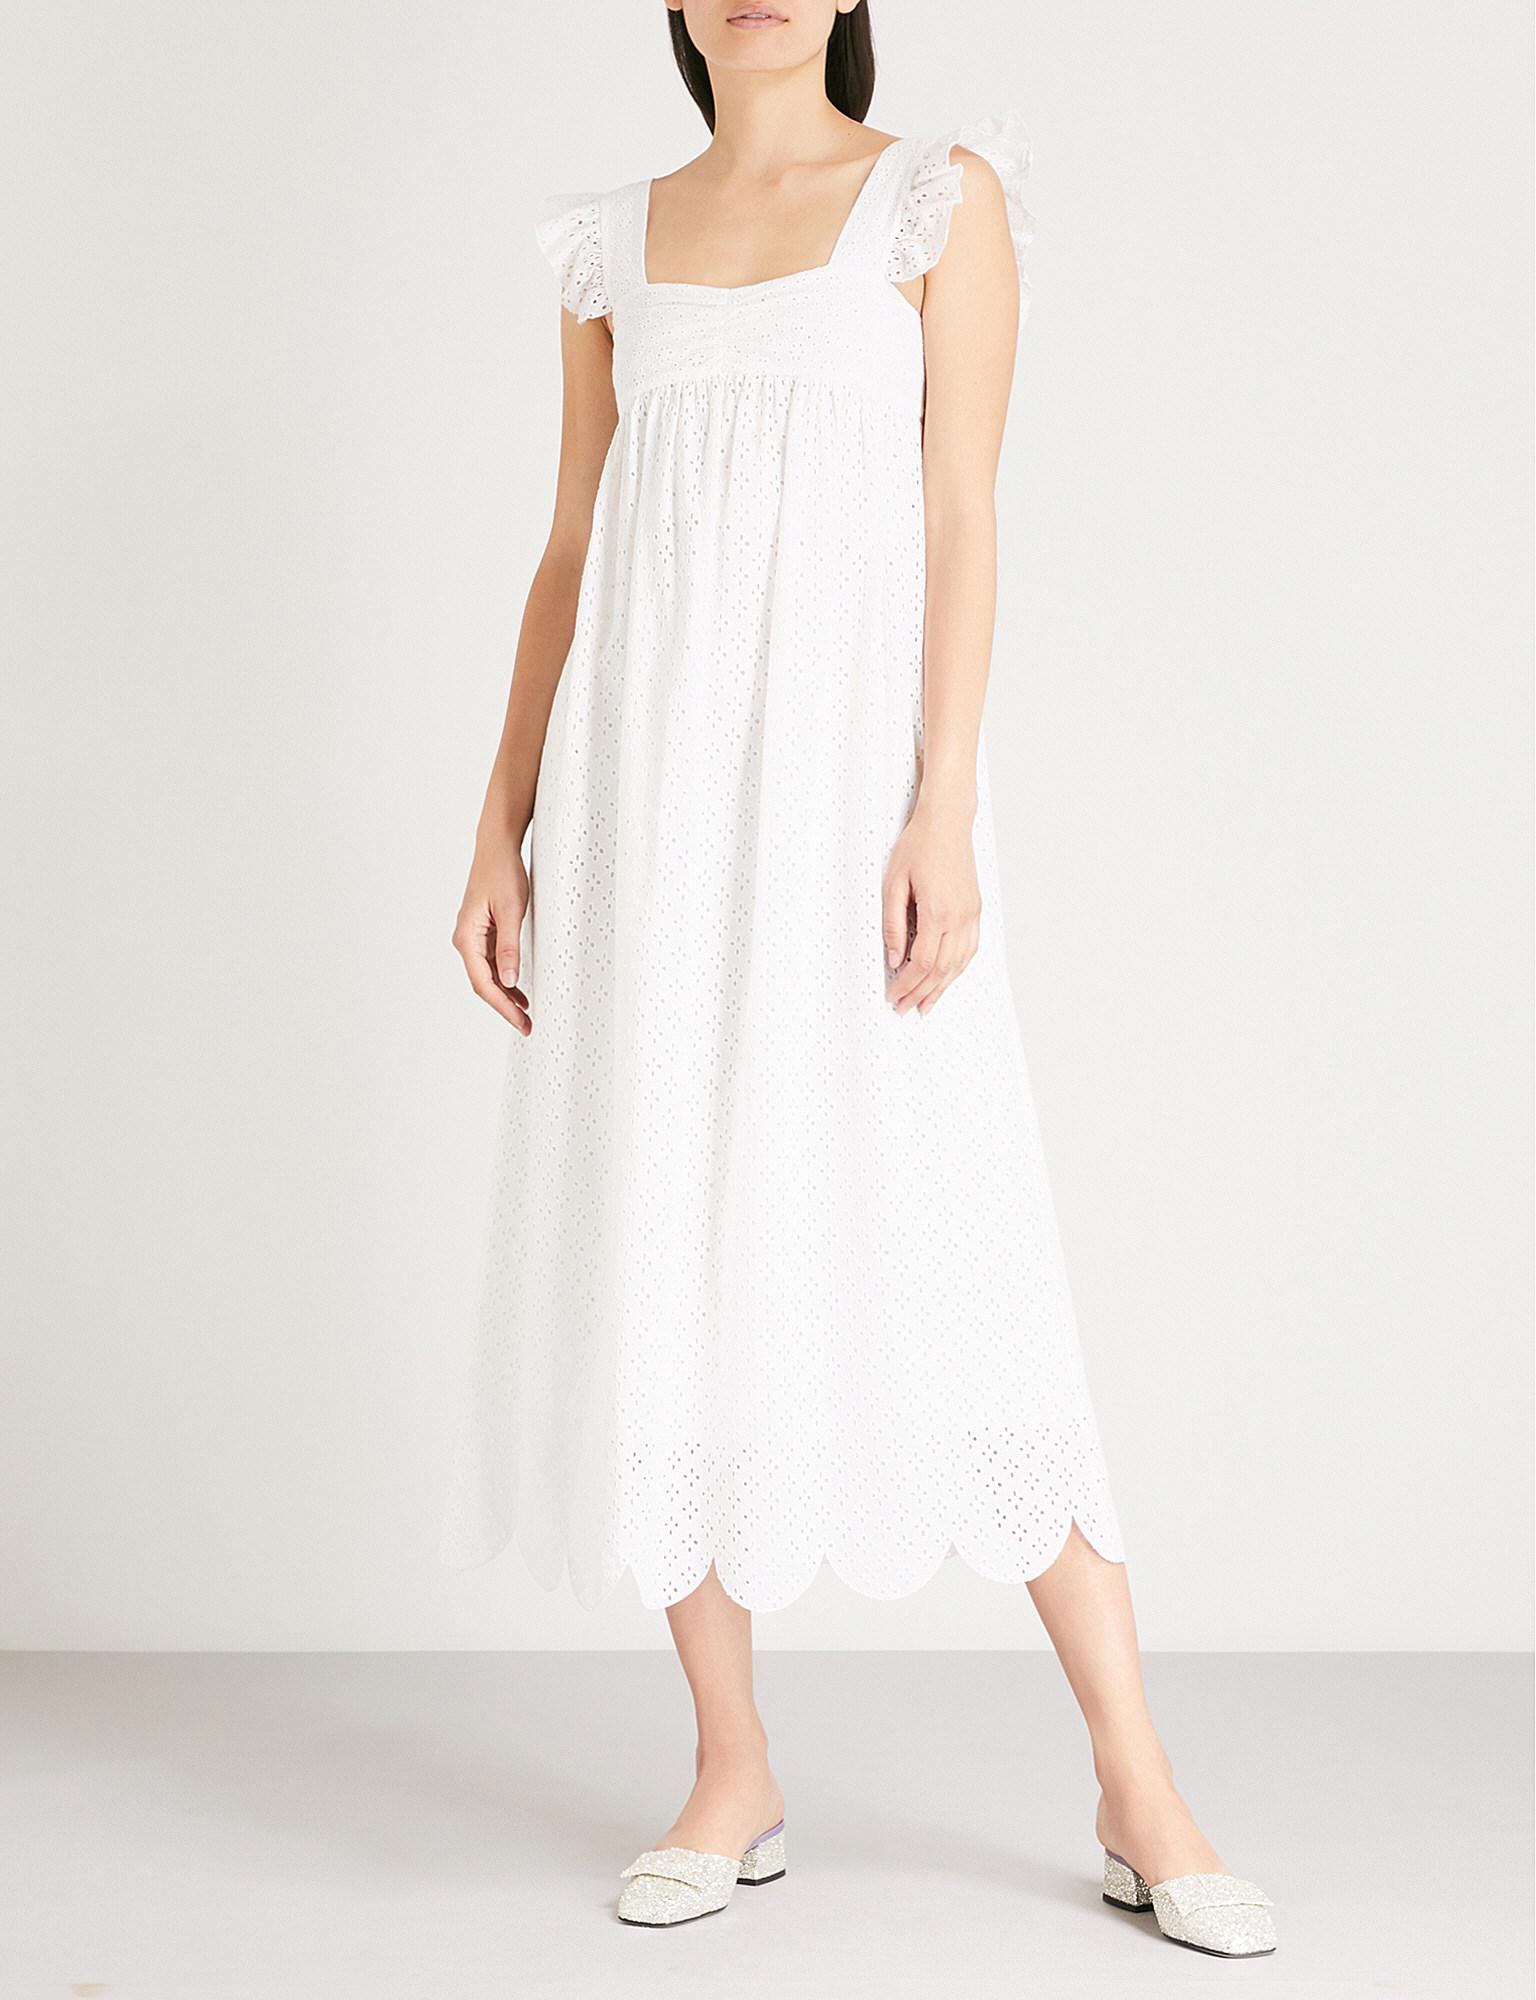 Alexa Chung Woman Gathered Embroidered Linen Mini Dress White Size 10 AlexaChung YI80kTjnv4